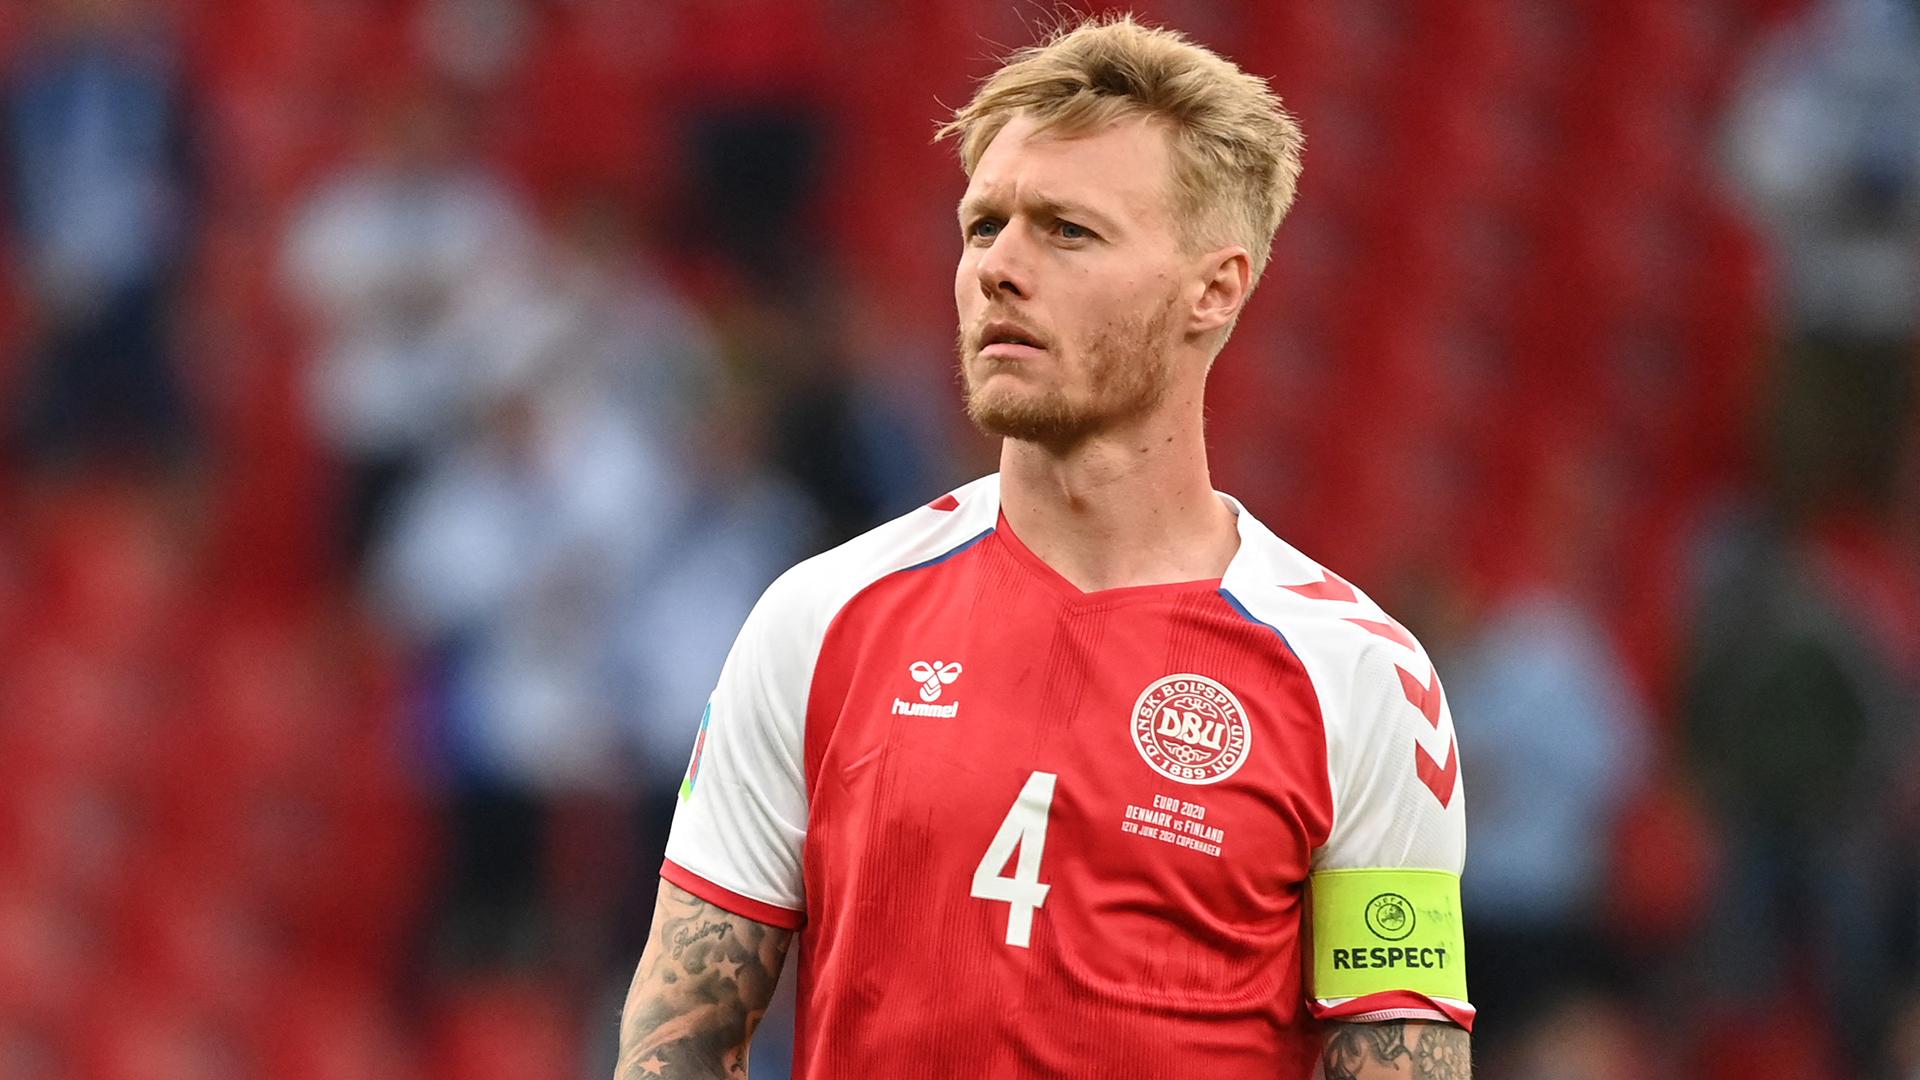 England vs Denmark: Team news, preview & predictions